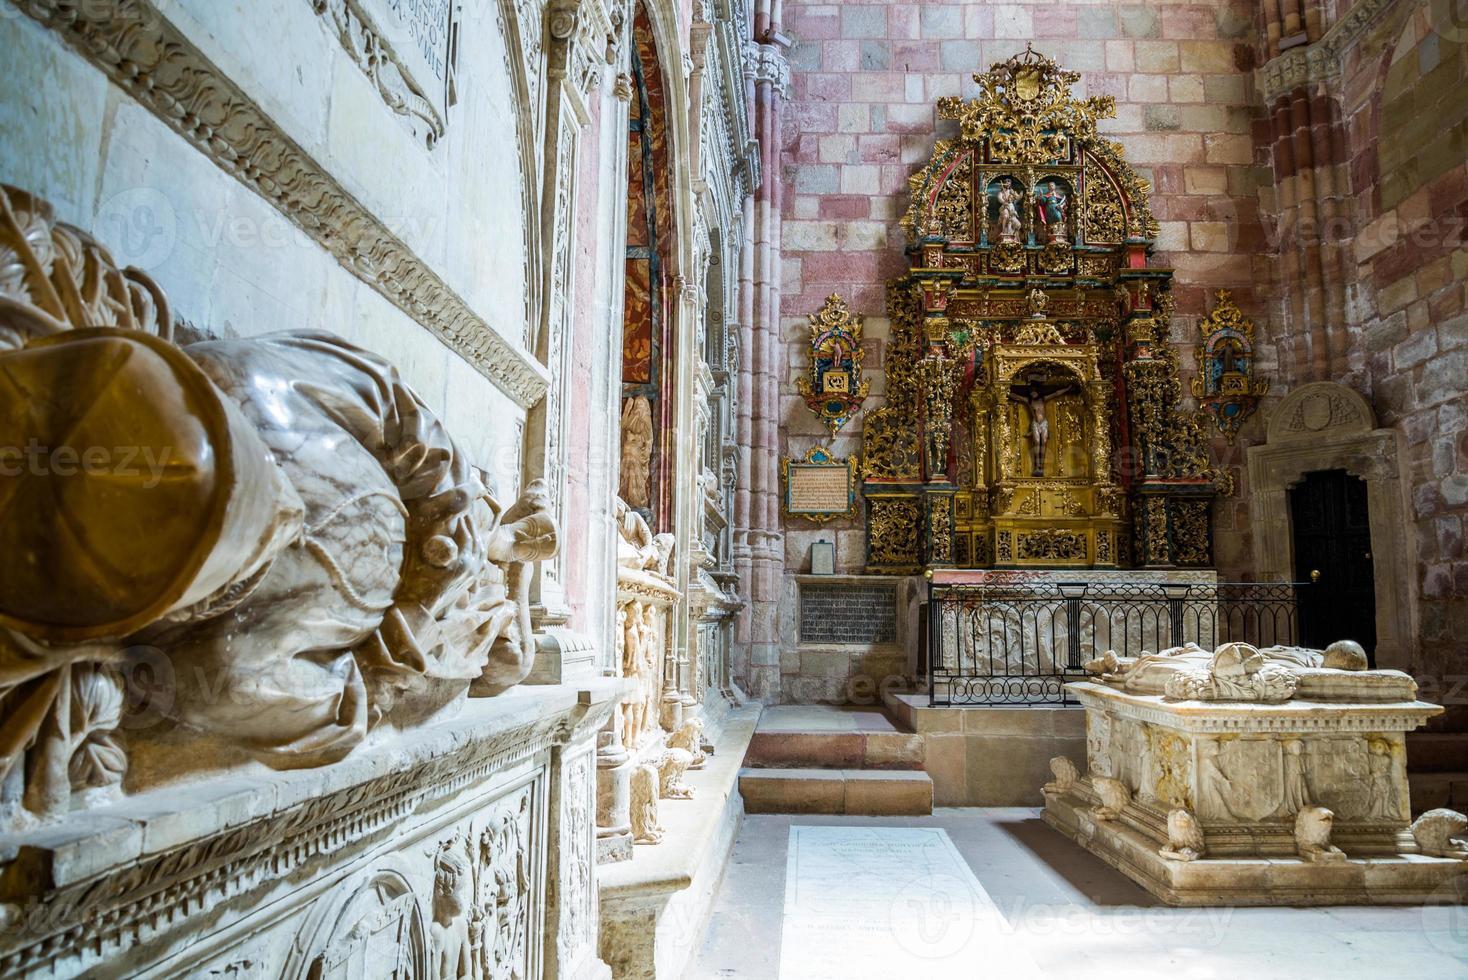 La cathédrale de Siguenza, Guadalajara, Espagne. photo